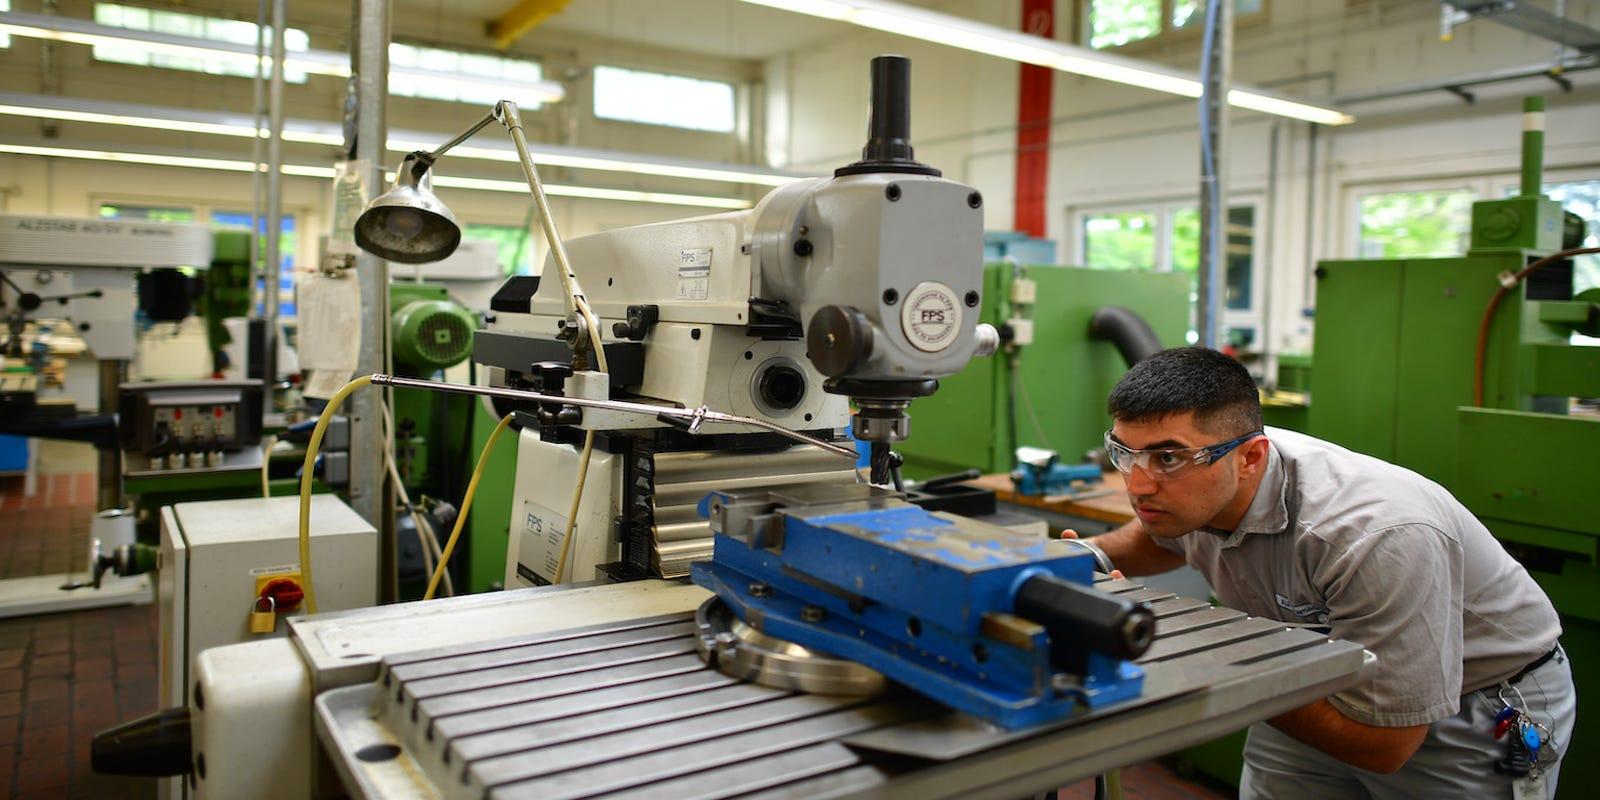 Jobs: US tariffs on China aren't bringing back factories